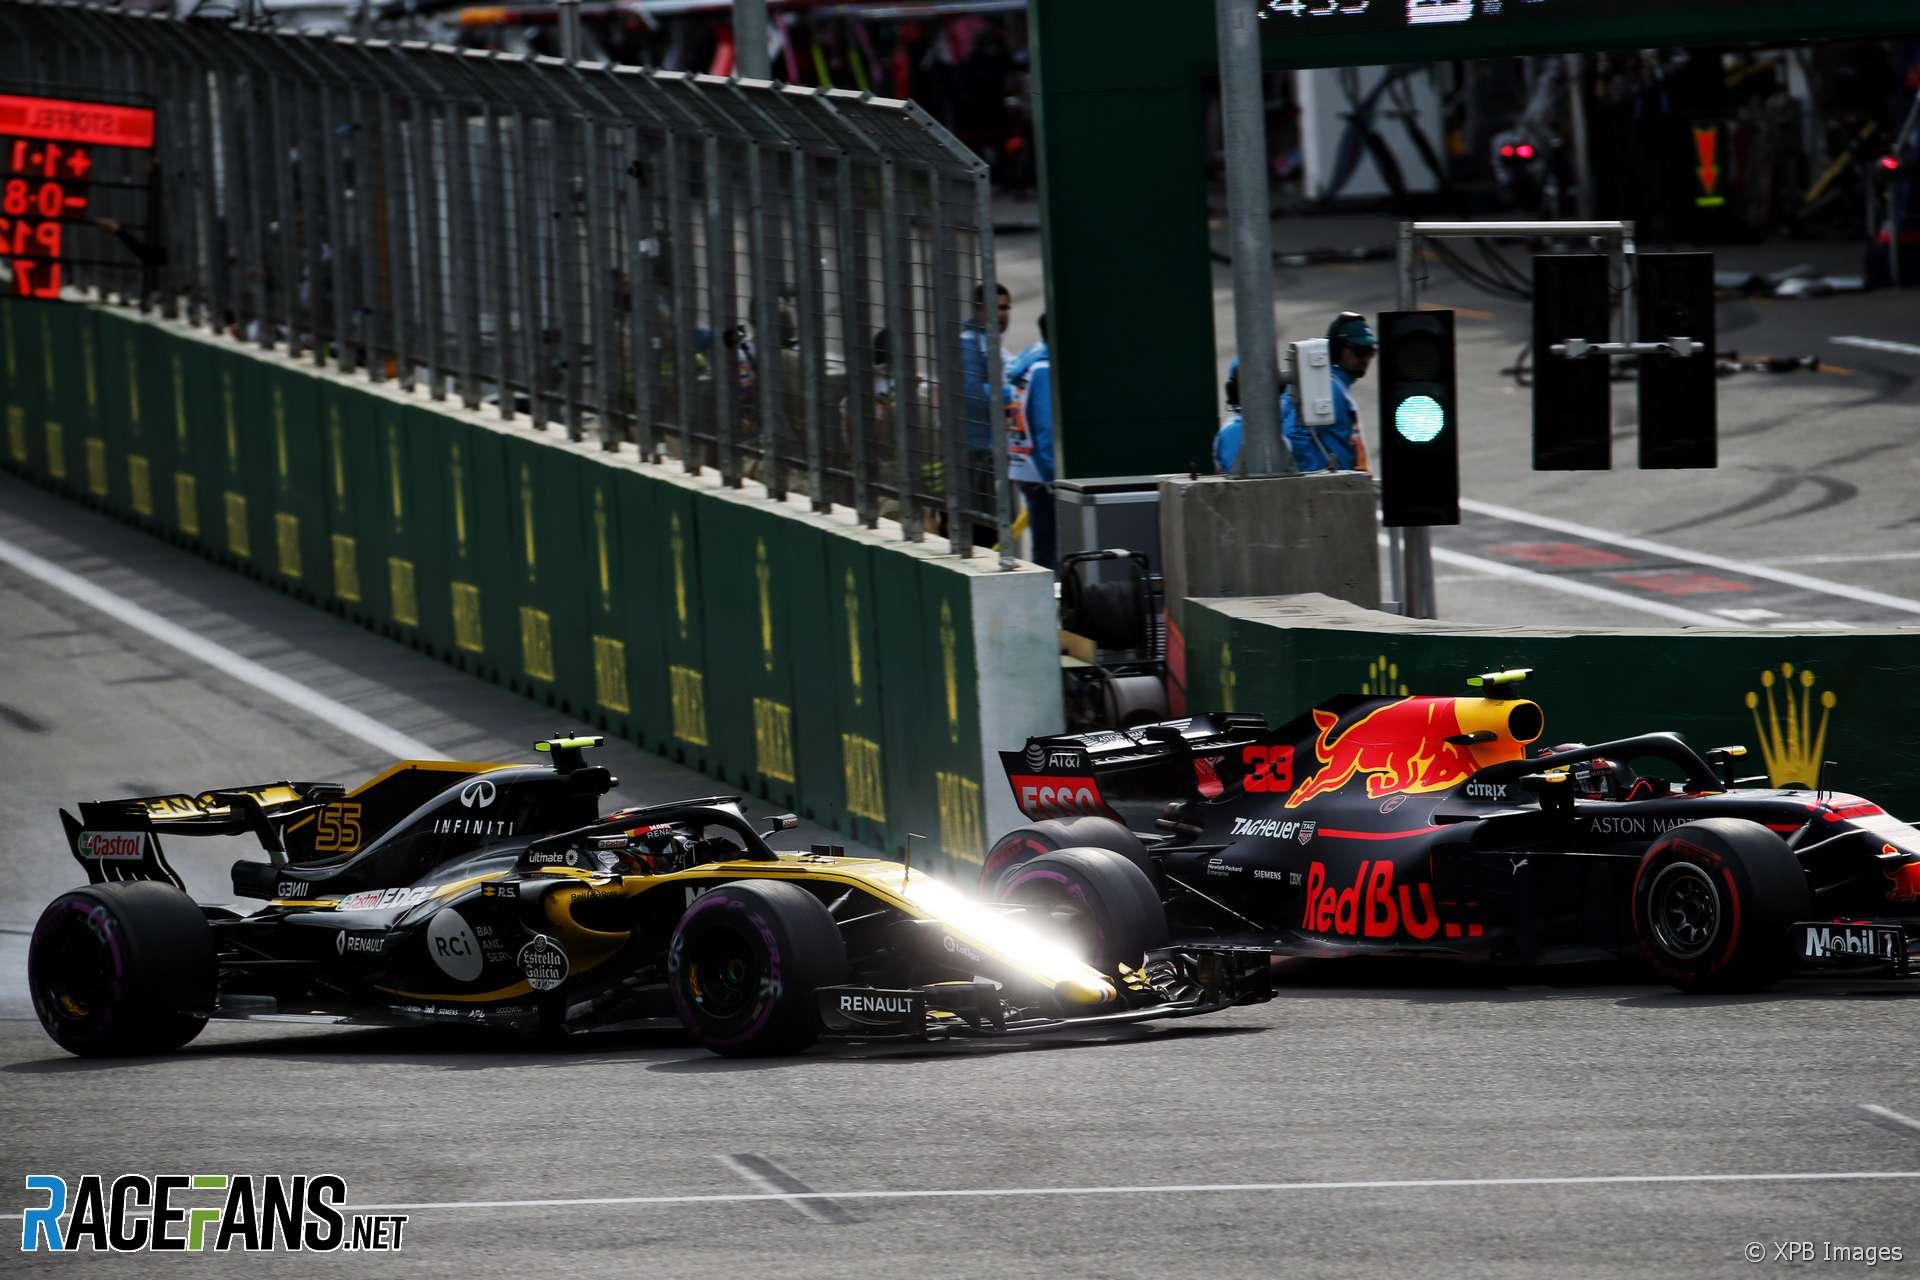 Carlos Sainz Jnr, Renault, Baku City Circuit, 2018